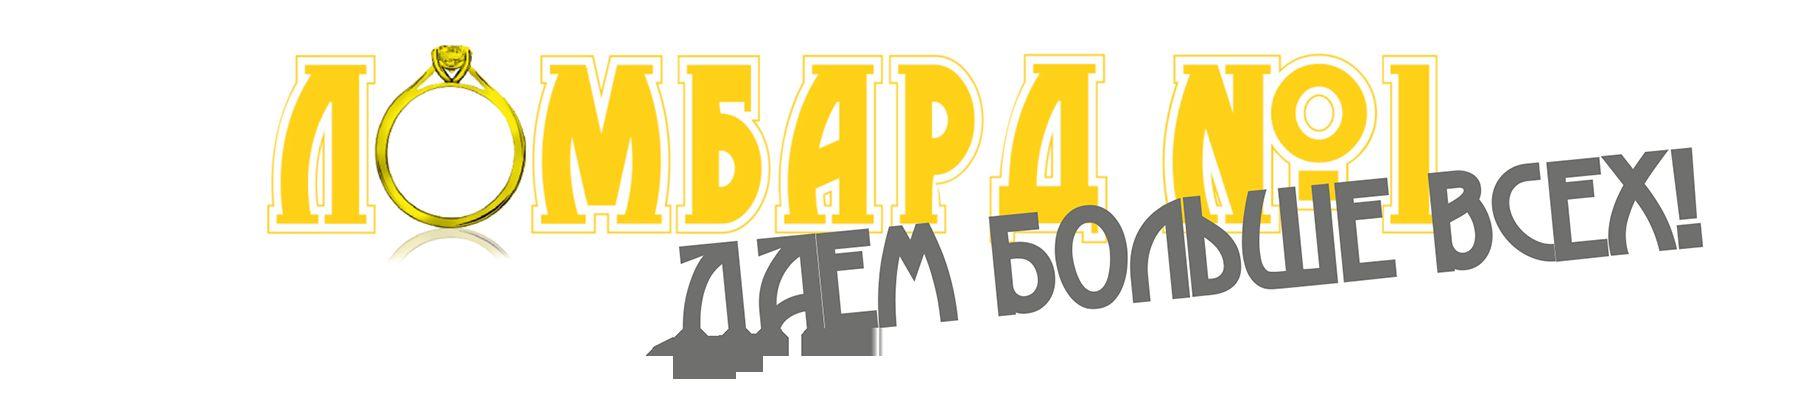 Дизайн логотипа Ломбард №1 - дизайнер csfantozzi